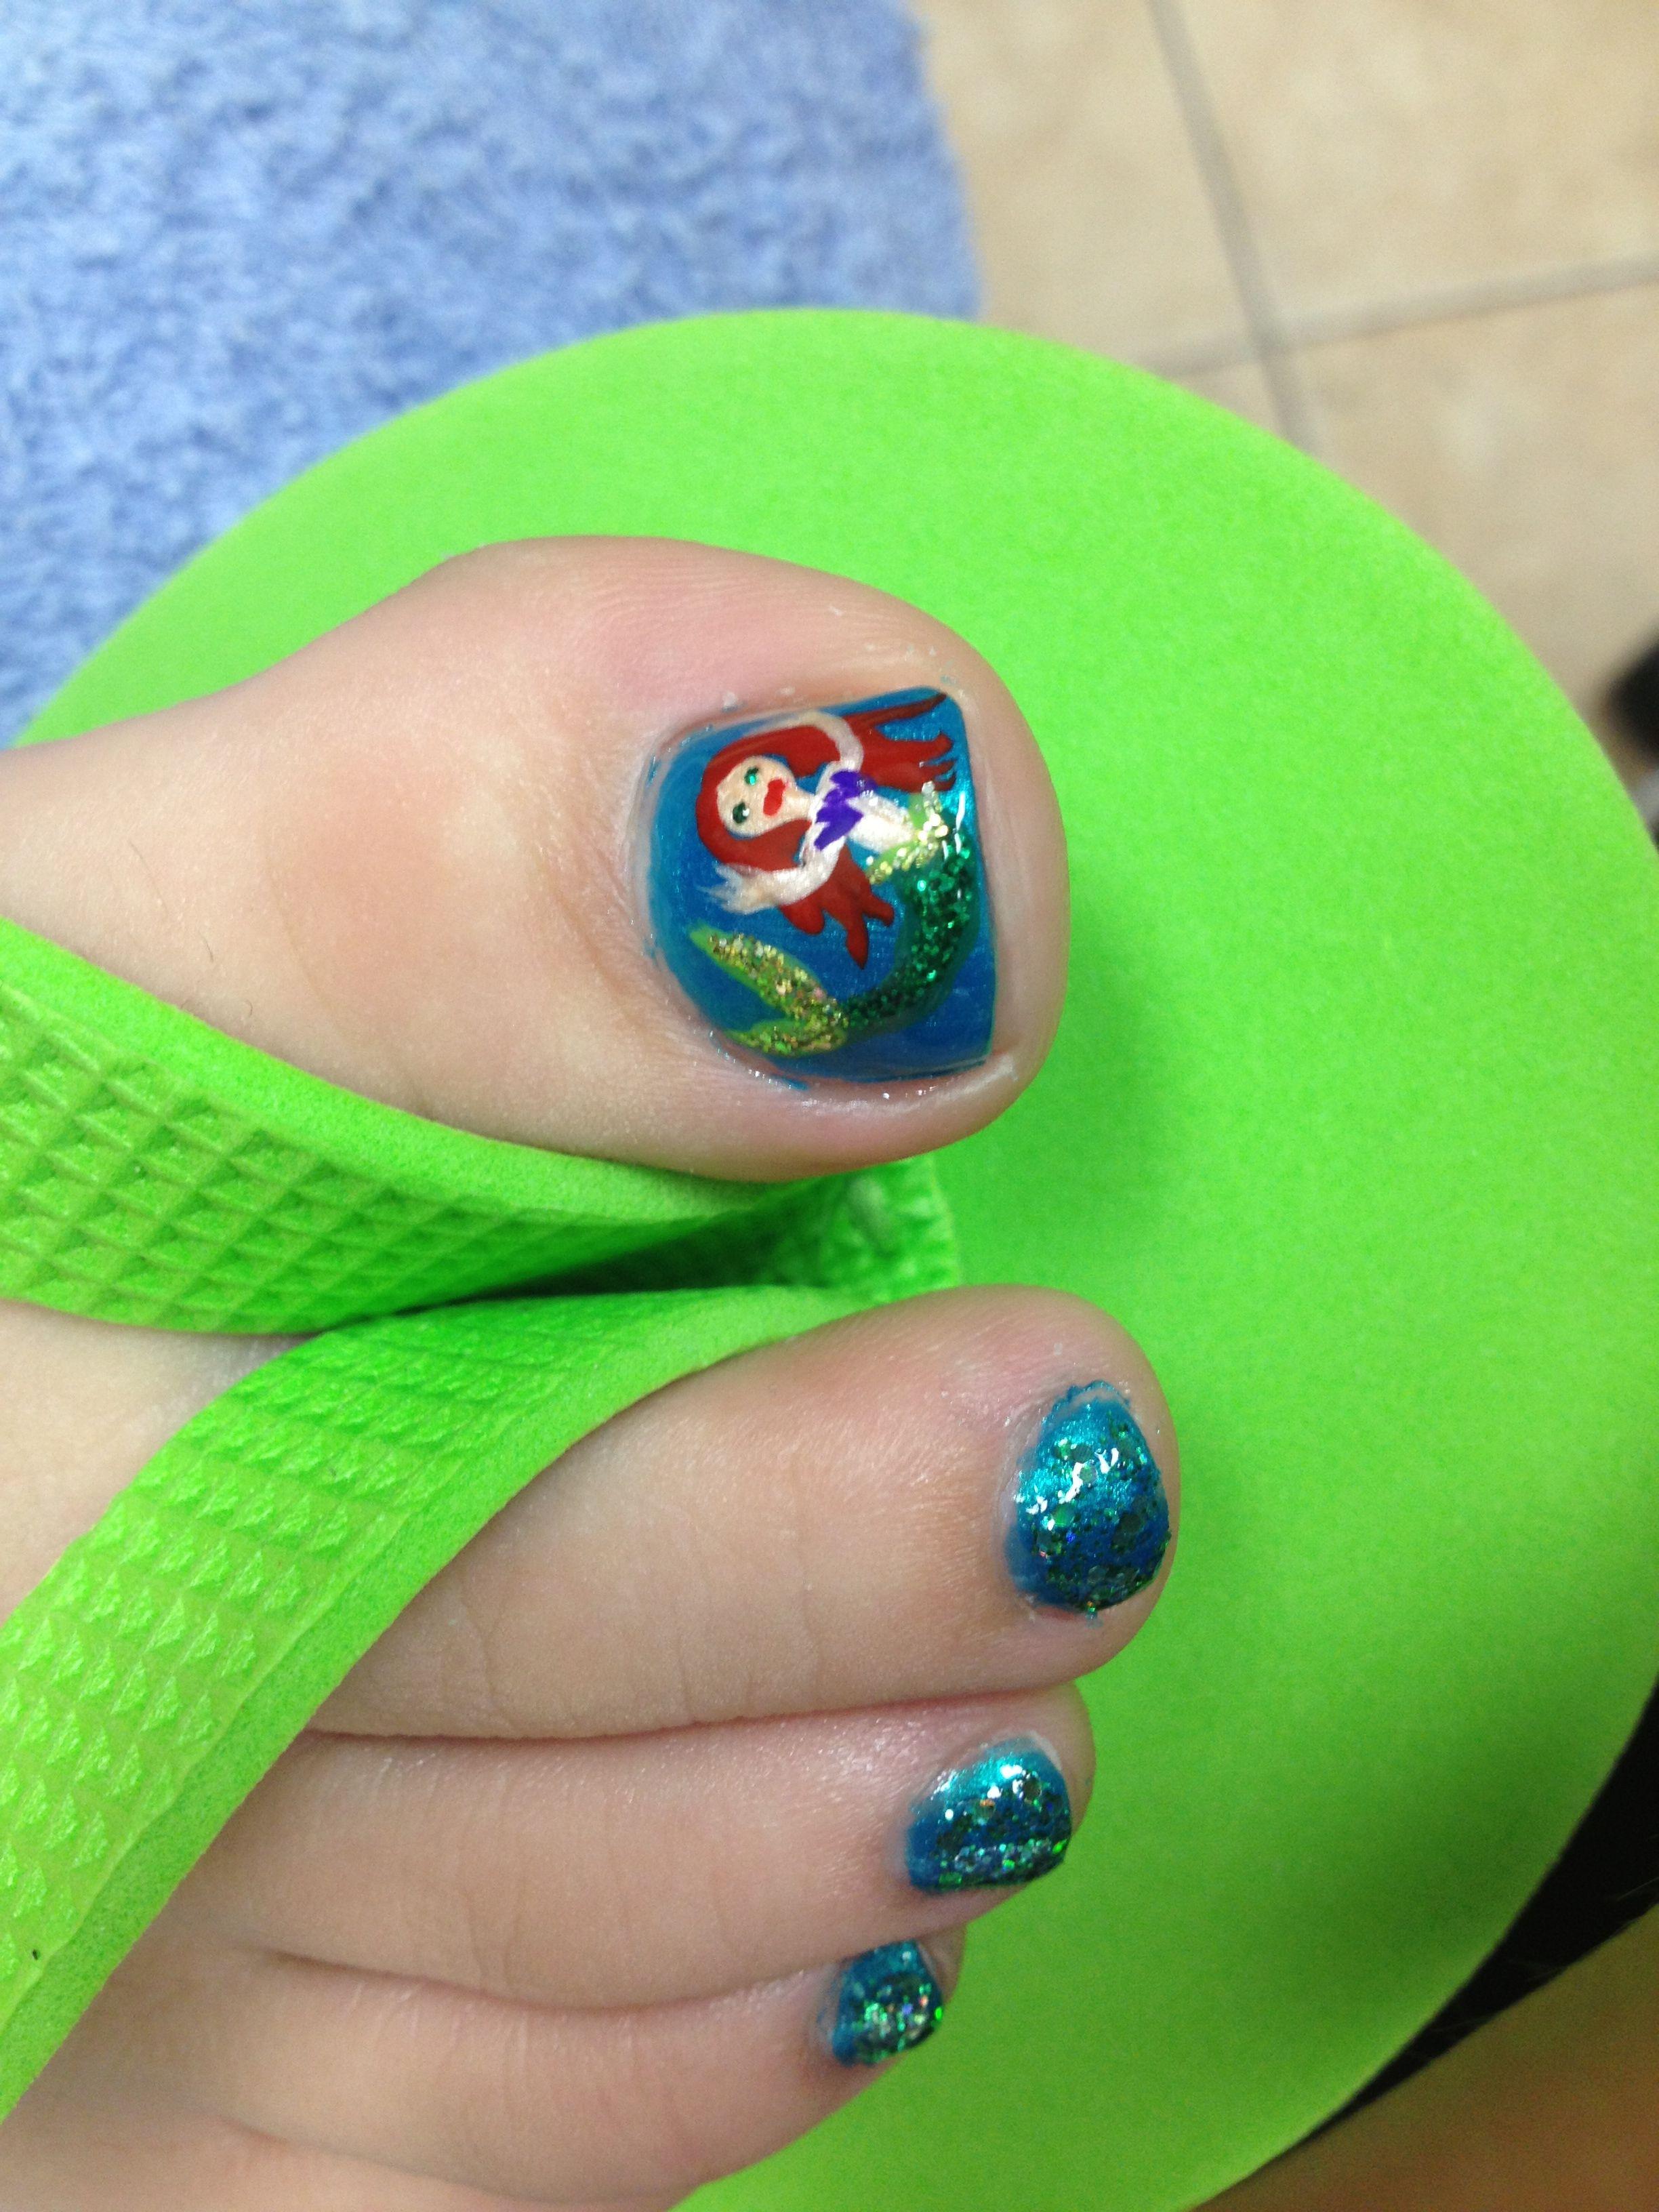 Mermaid toenail art | Nails! | Pinterest | Meerjungfrauen, Kunst und ...